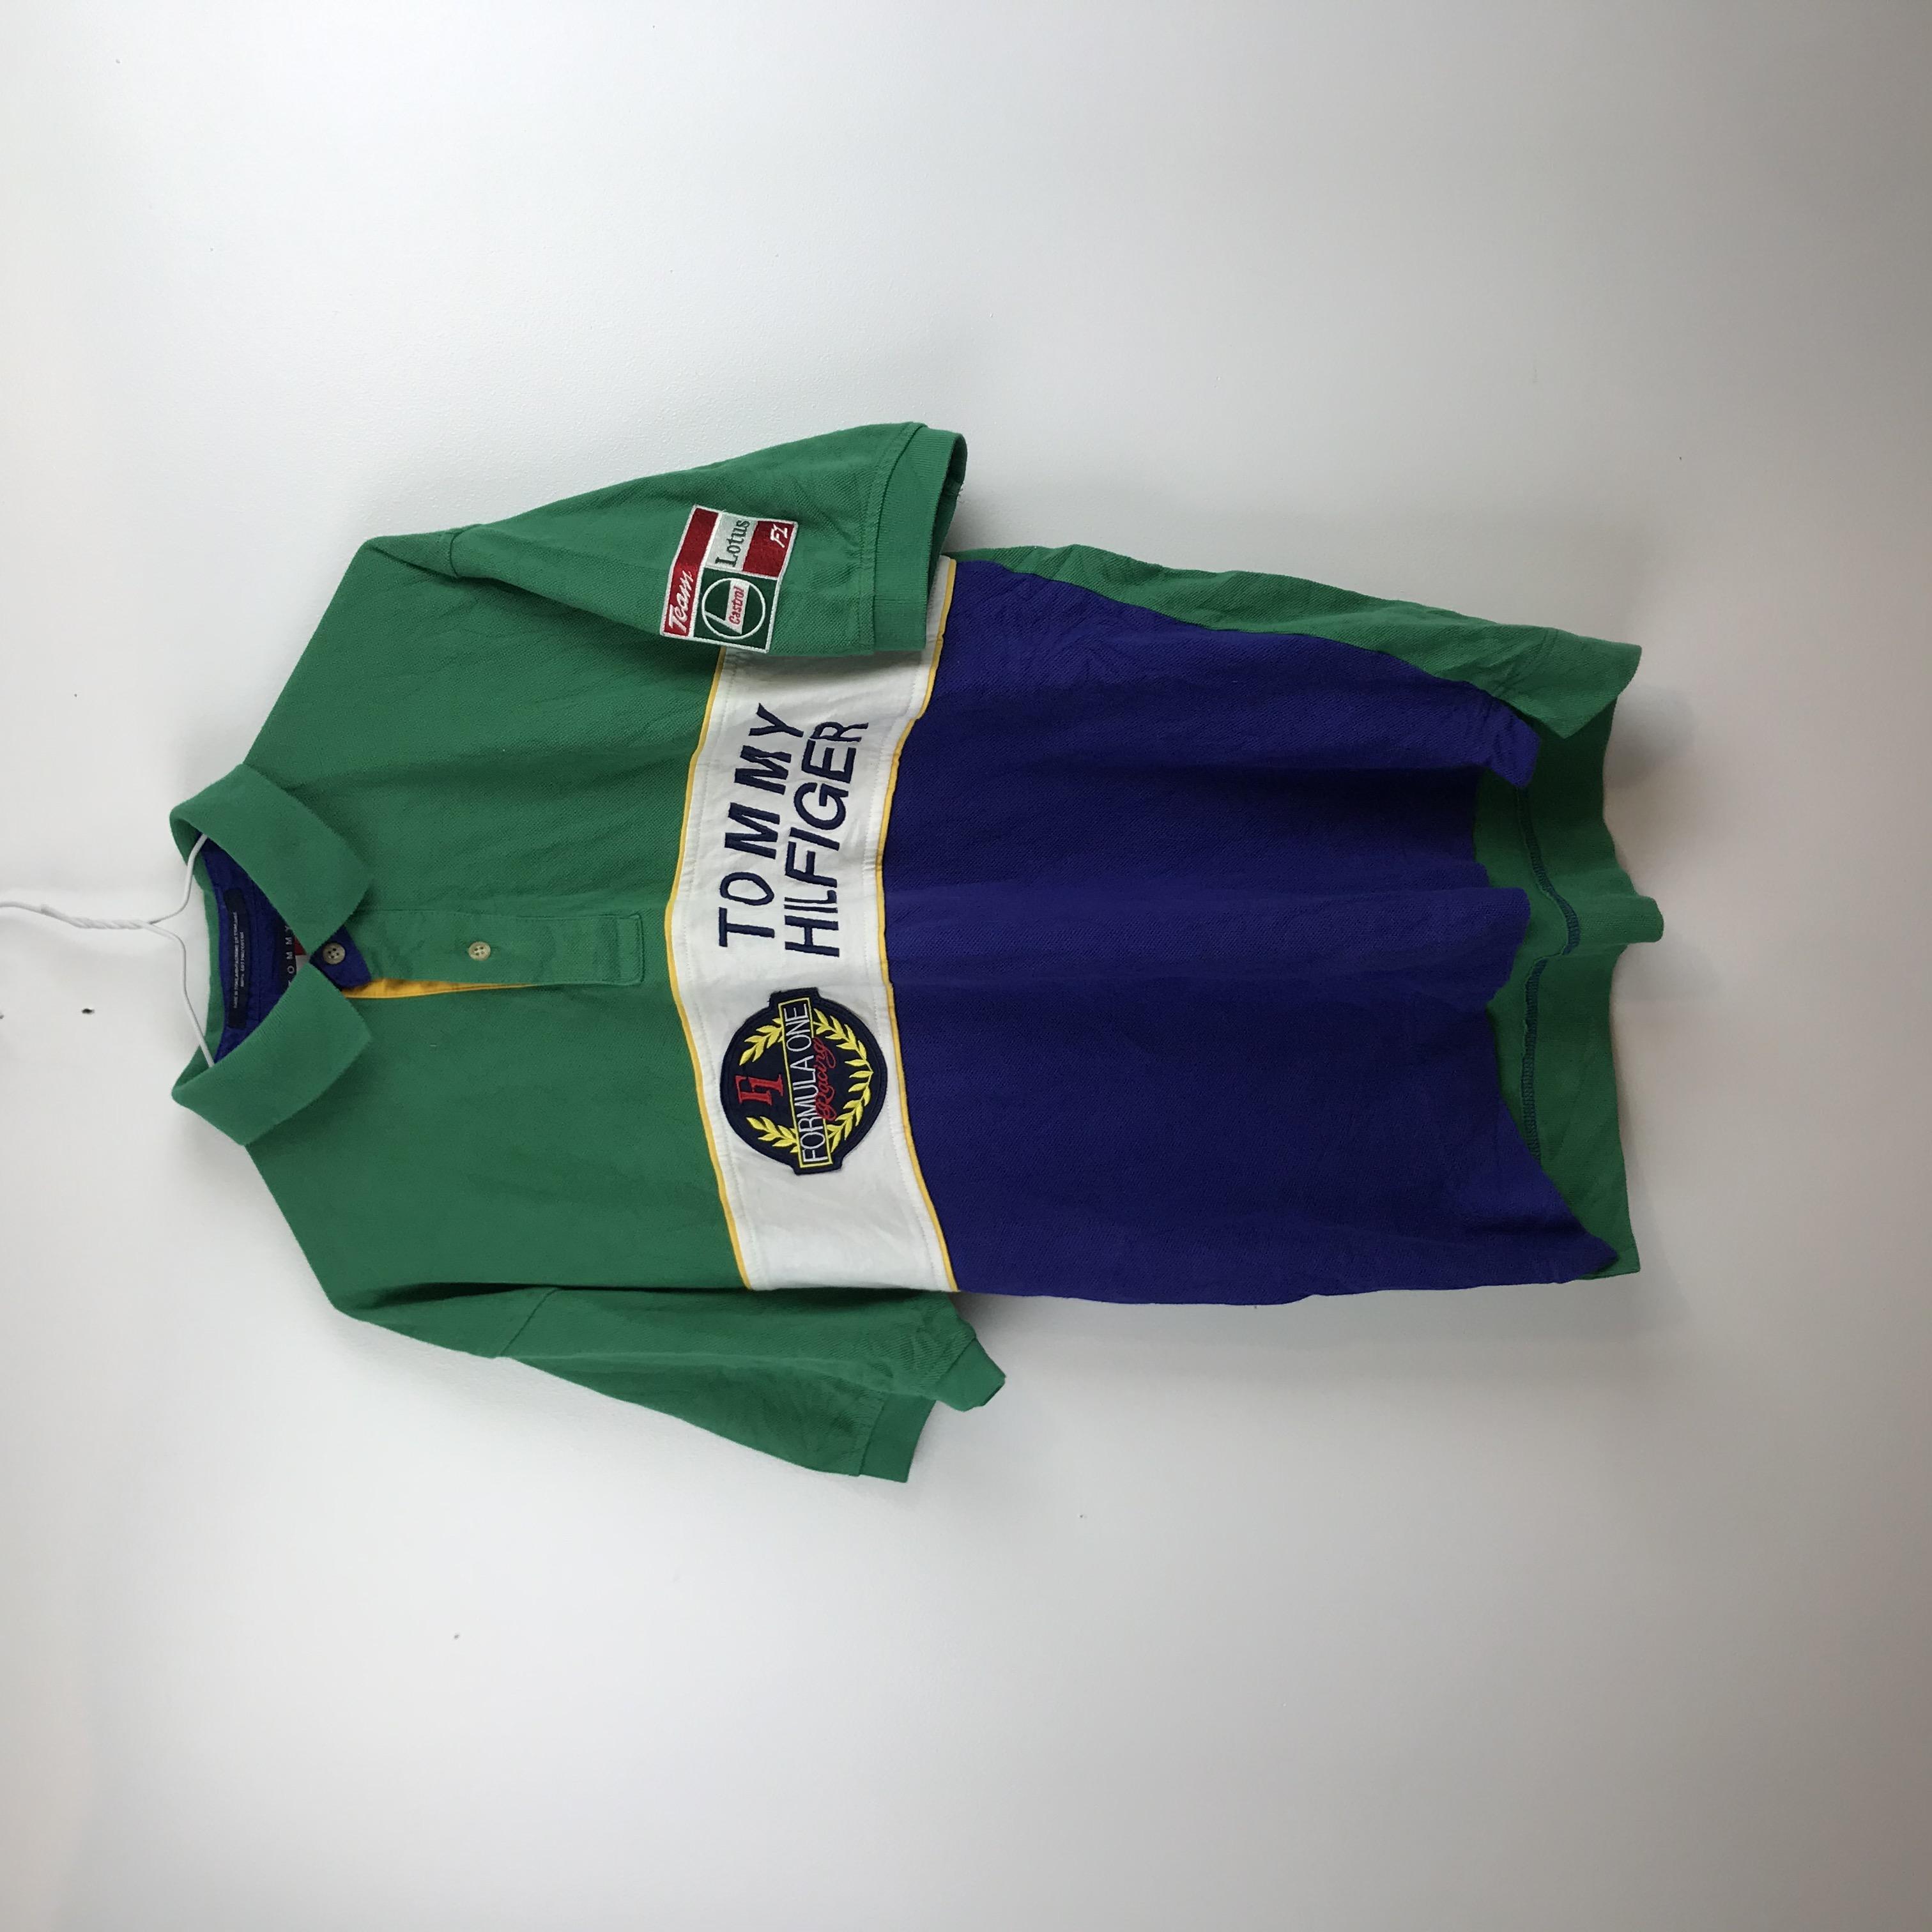 nuovo stile di vita POLO shirt per adulti Formula One 1 LOTUS F1 Team Romain Grosjean